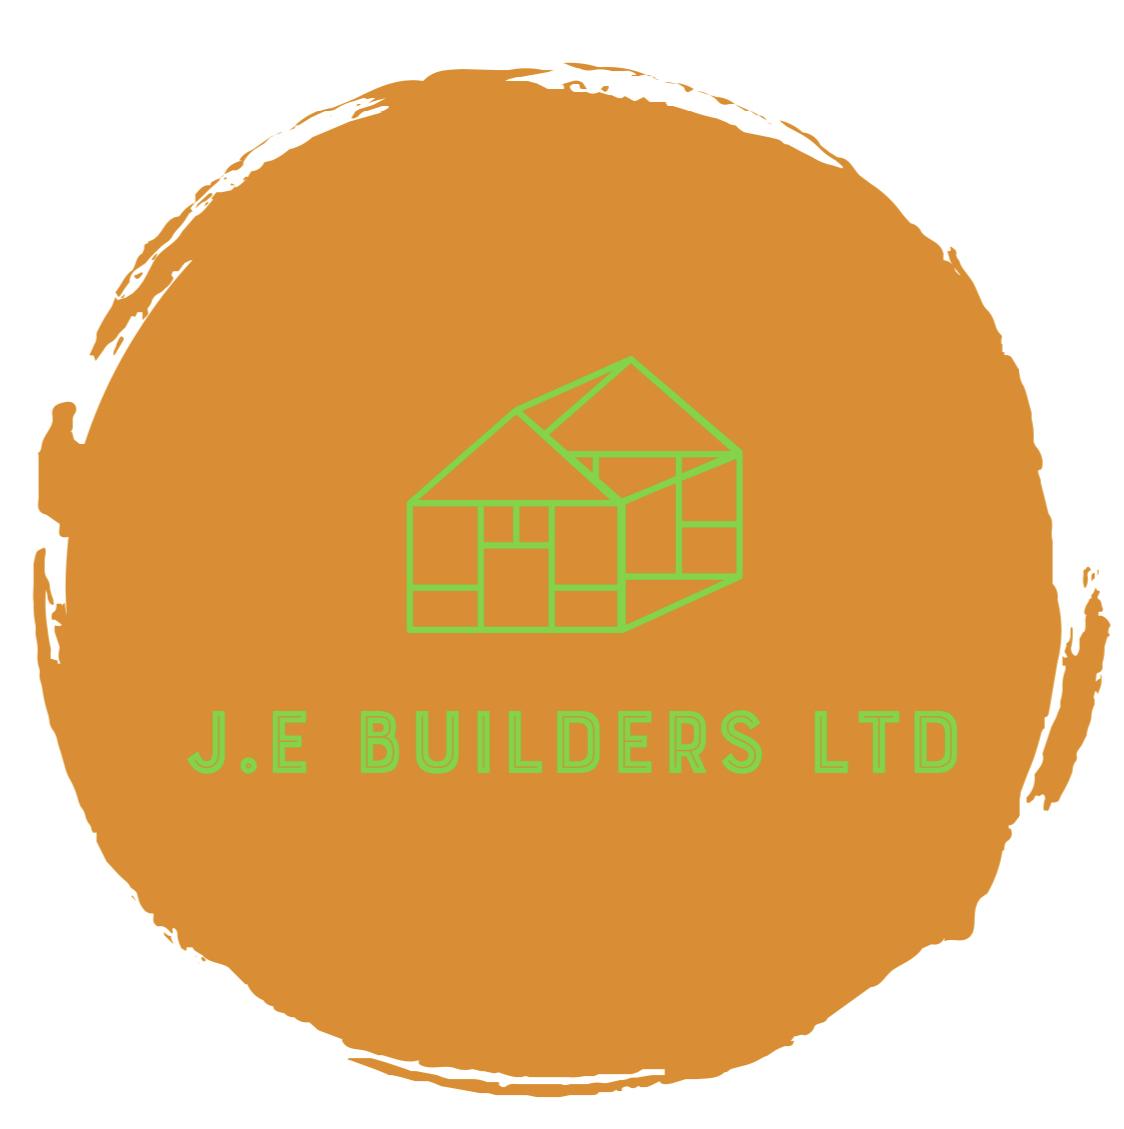 J.E Builders Ltd Verified Logo